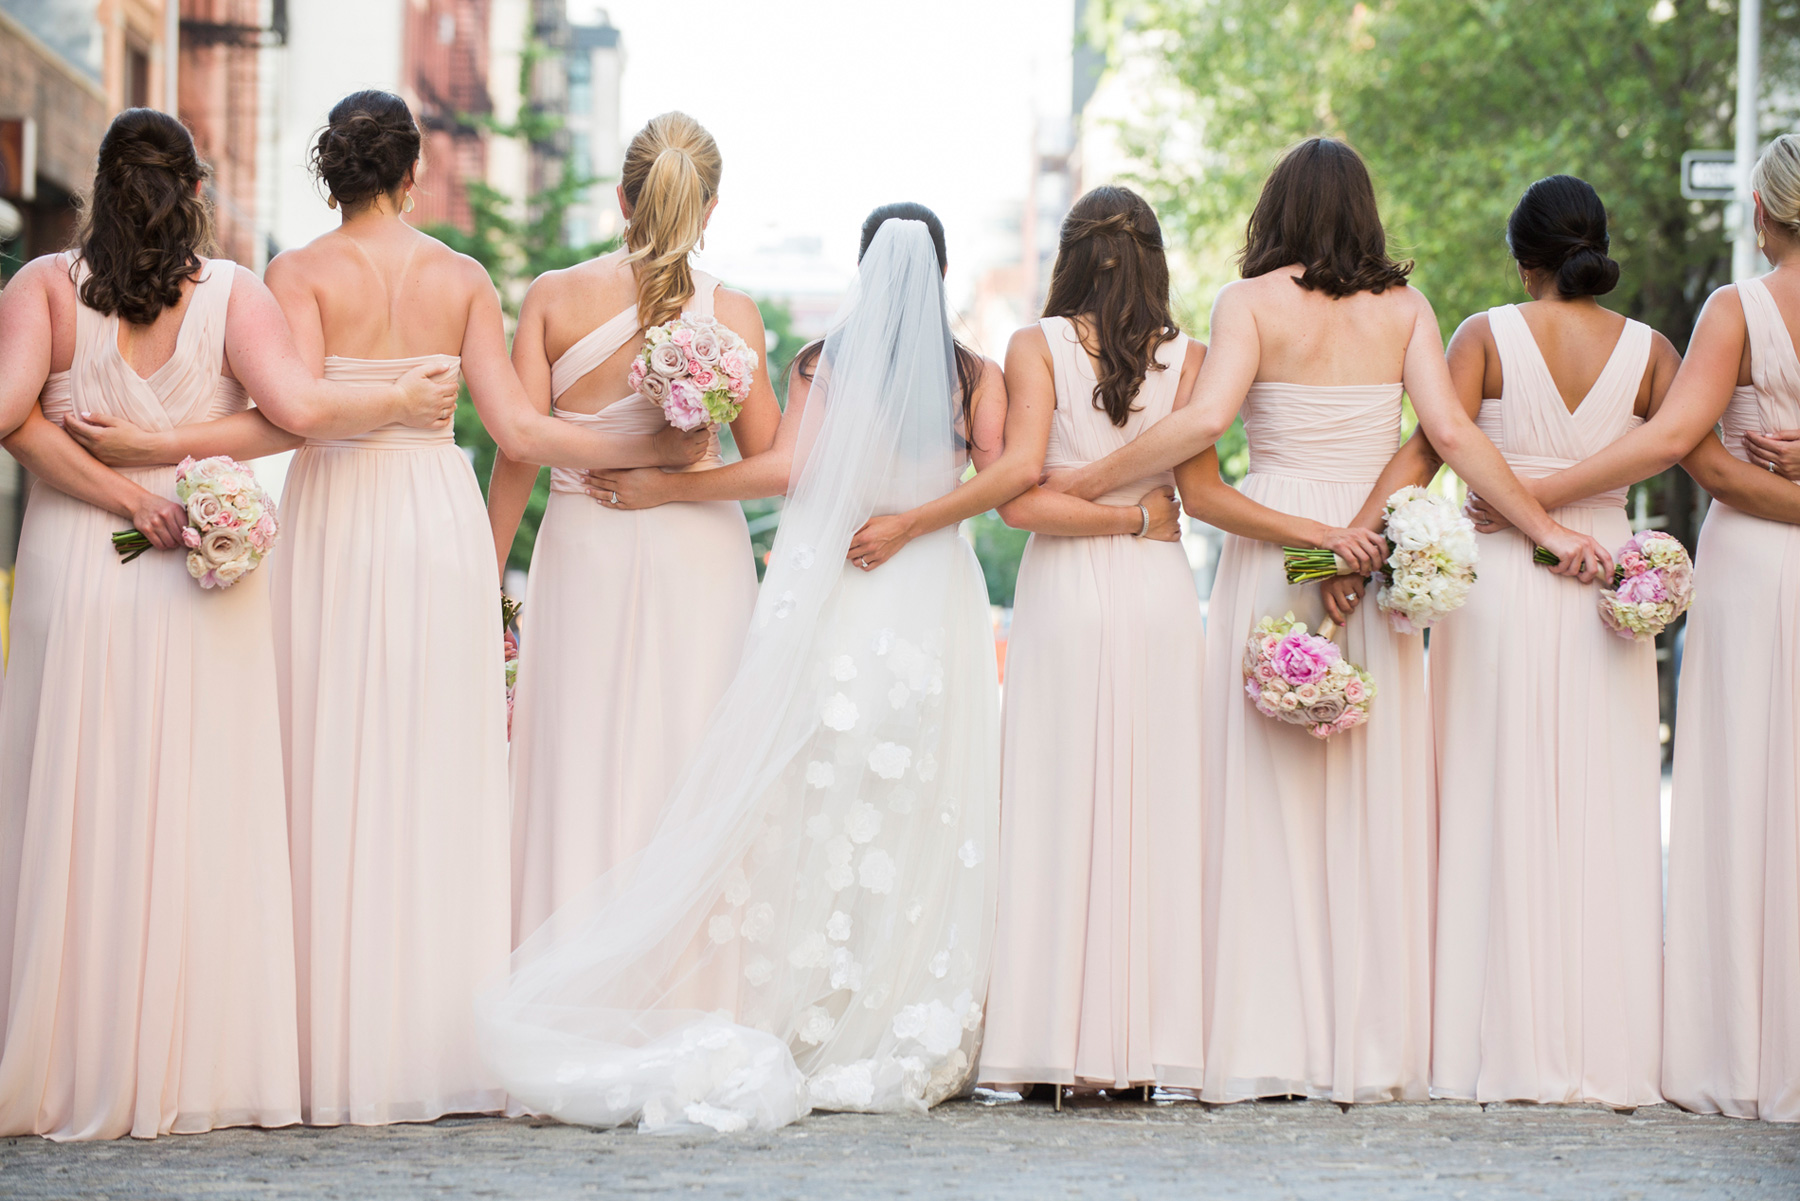 Back of bridesmaids different dresses same color pink